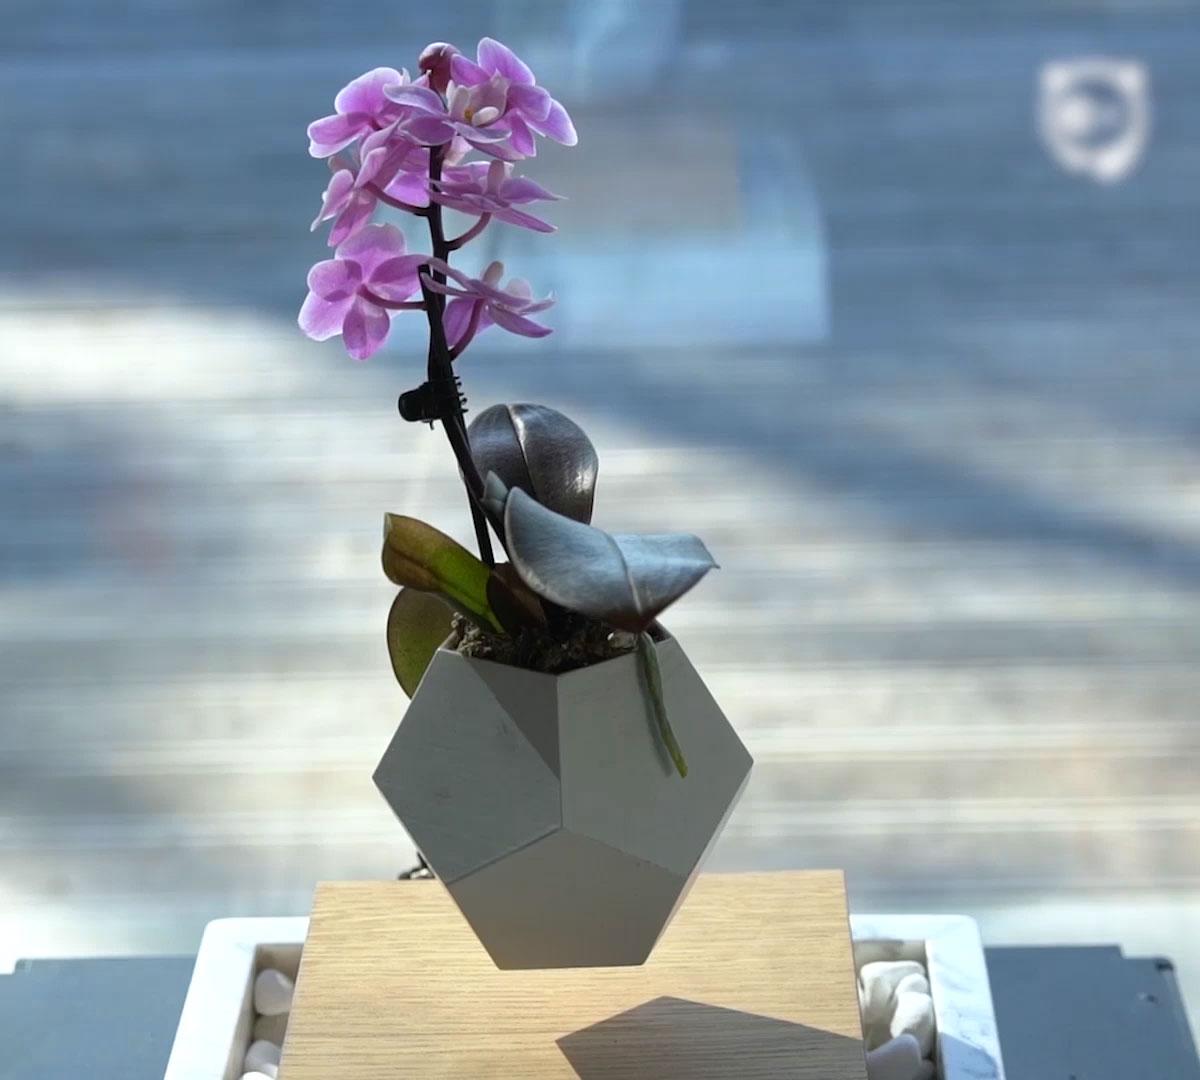 Levitating Flower Pot | Bored Panda